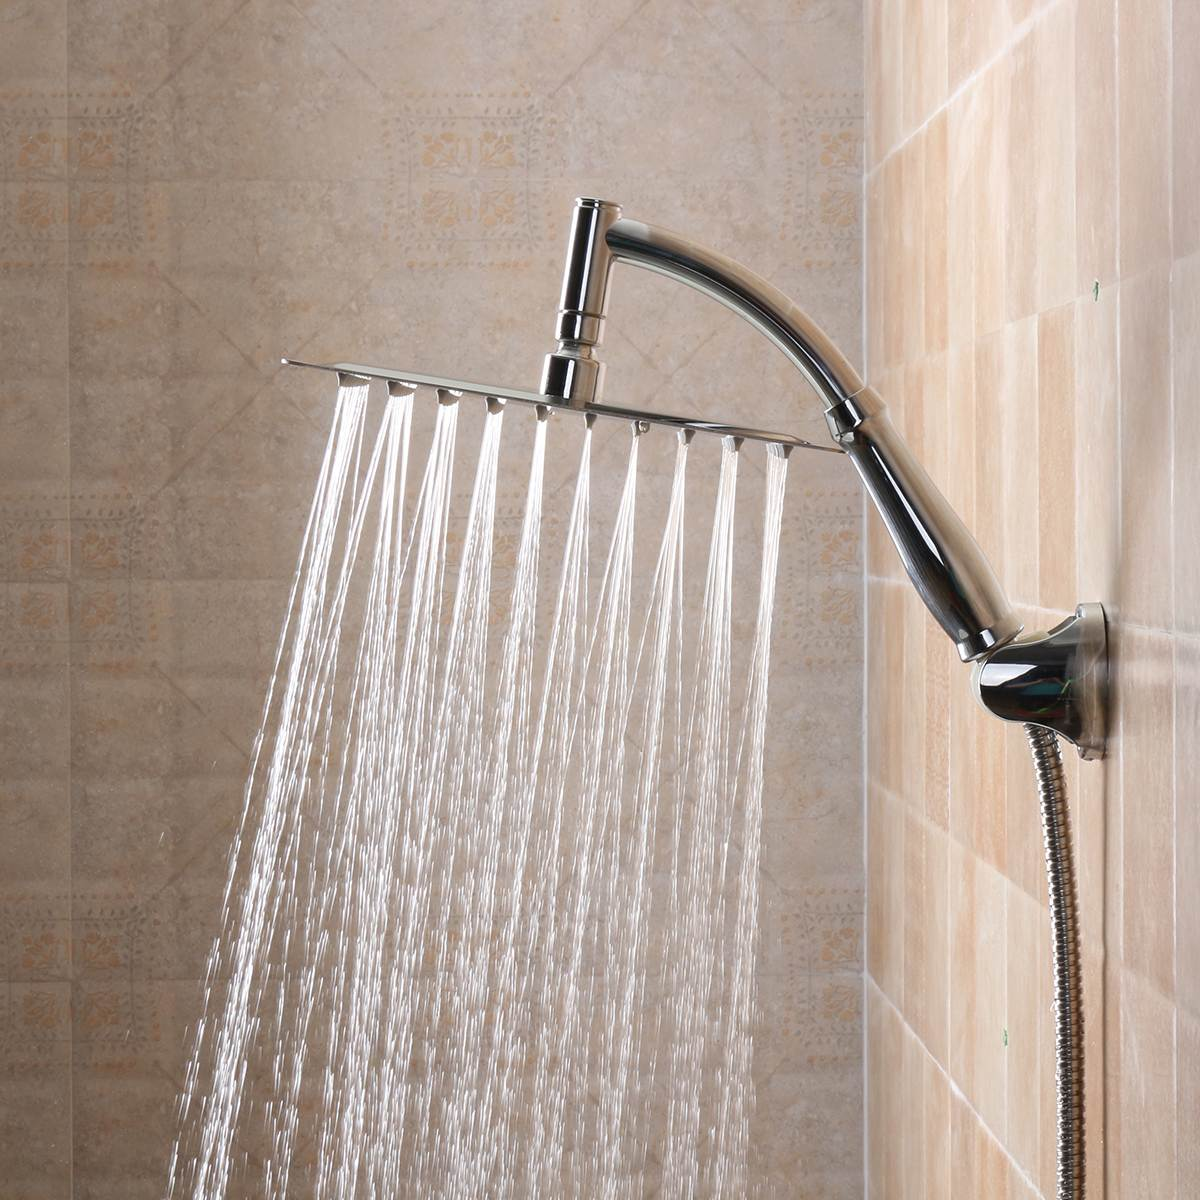 10 inch rain shower head. 10 Inch Square Bathroom Stainless Steel Rain Shower Head Rainfall  Ultra thin Chrome Online Get Cheap Aliexpress com Alibaba Group